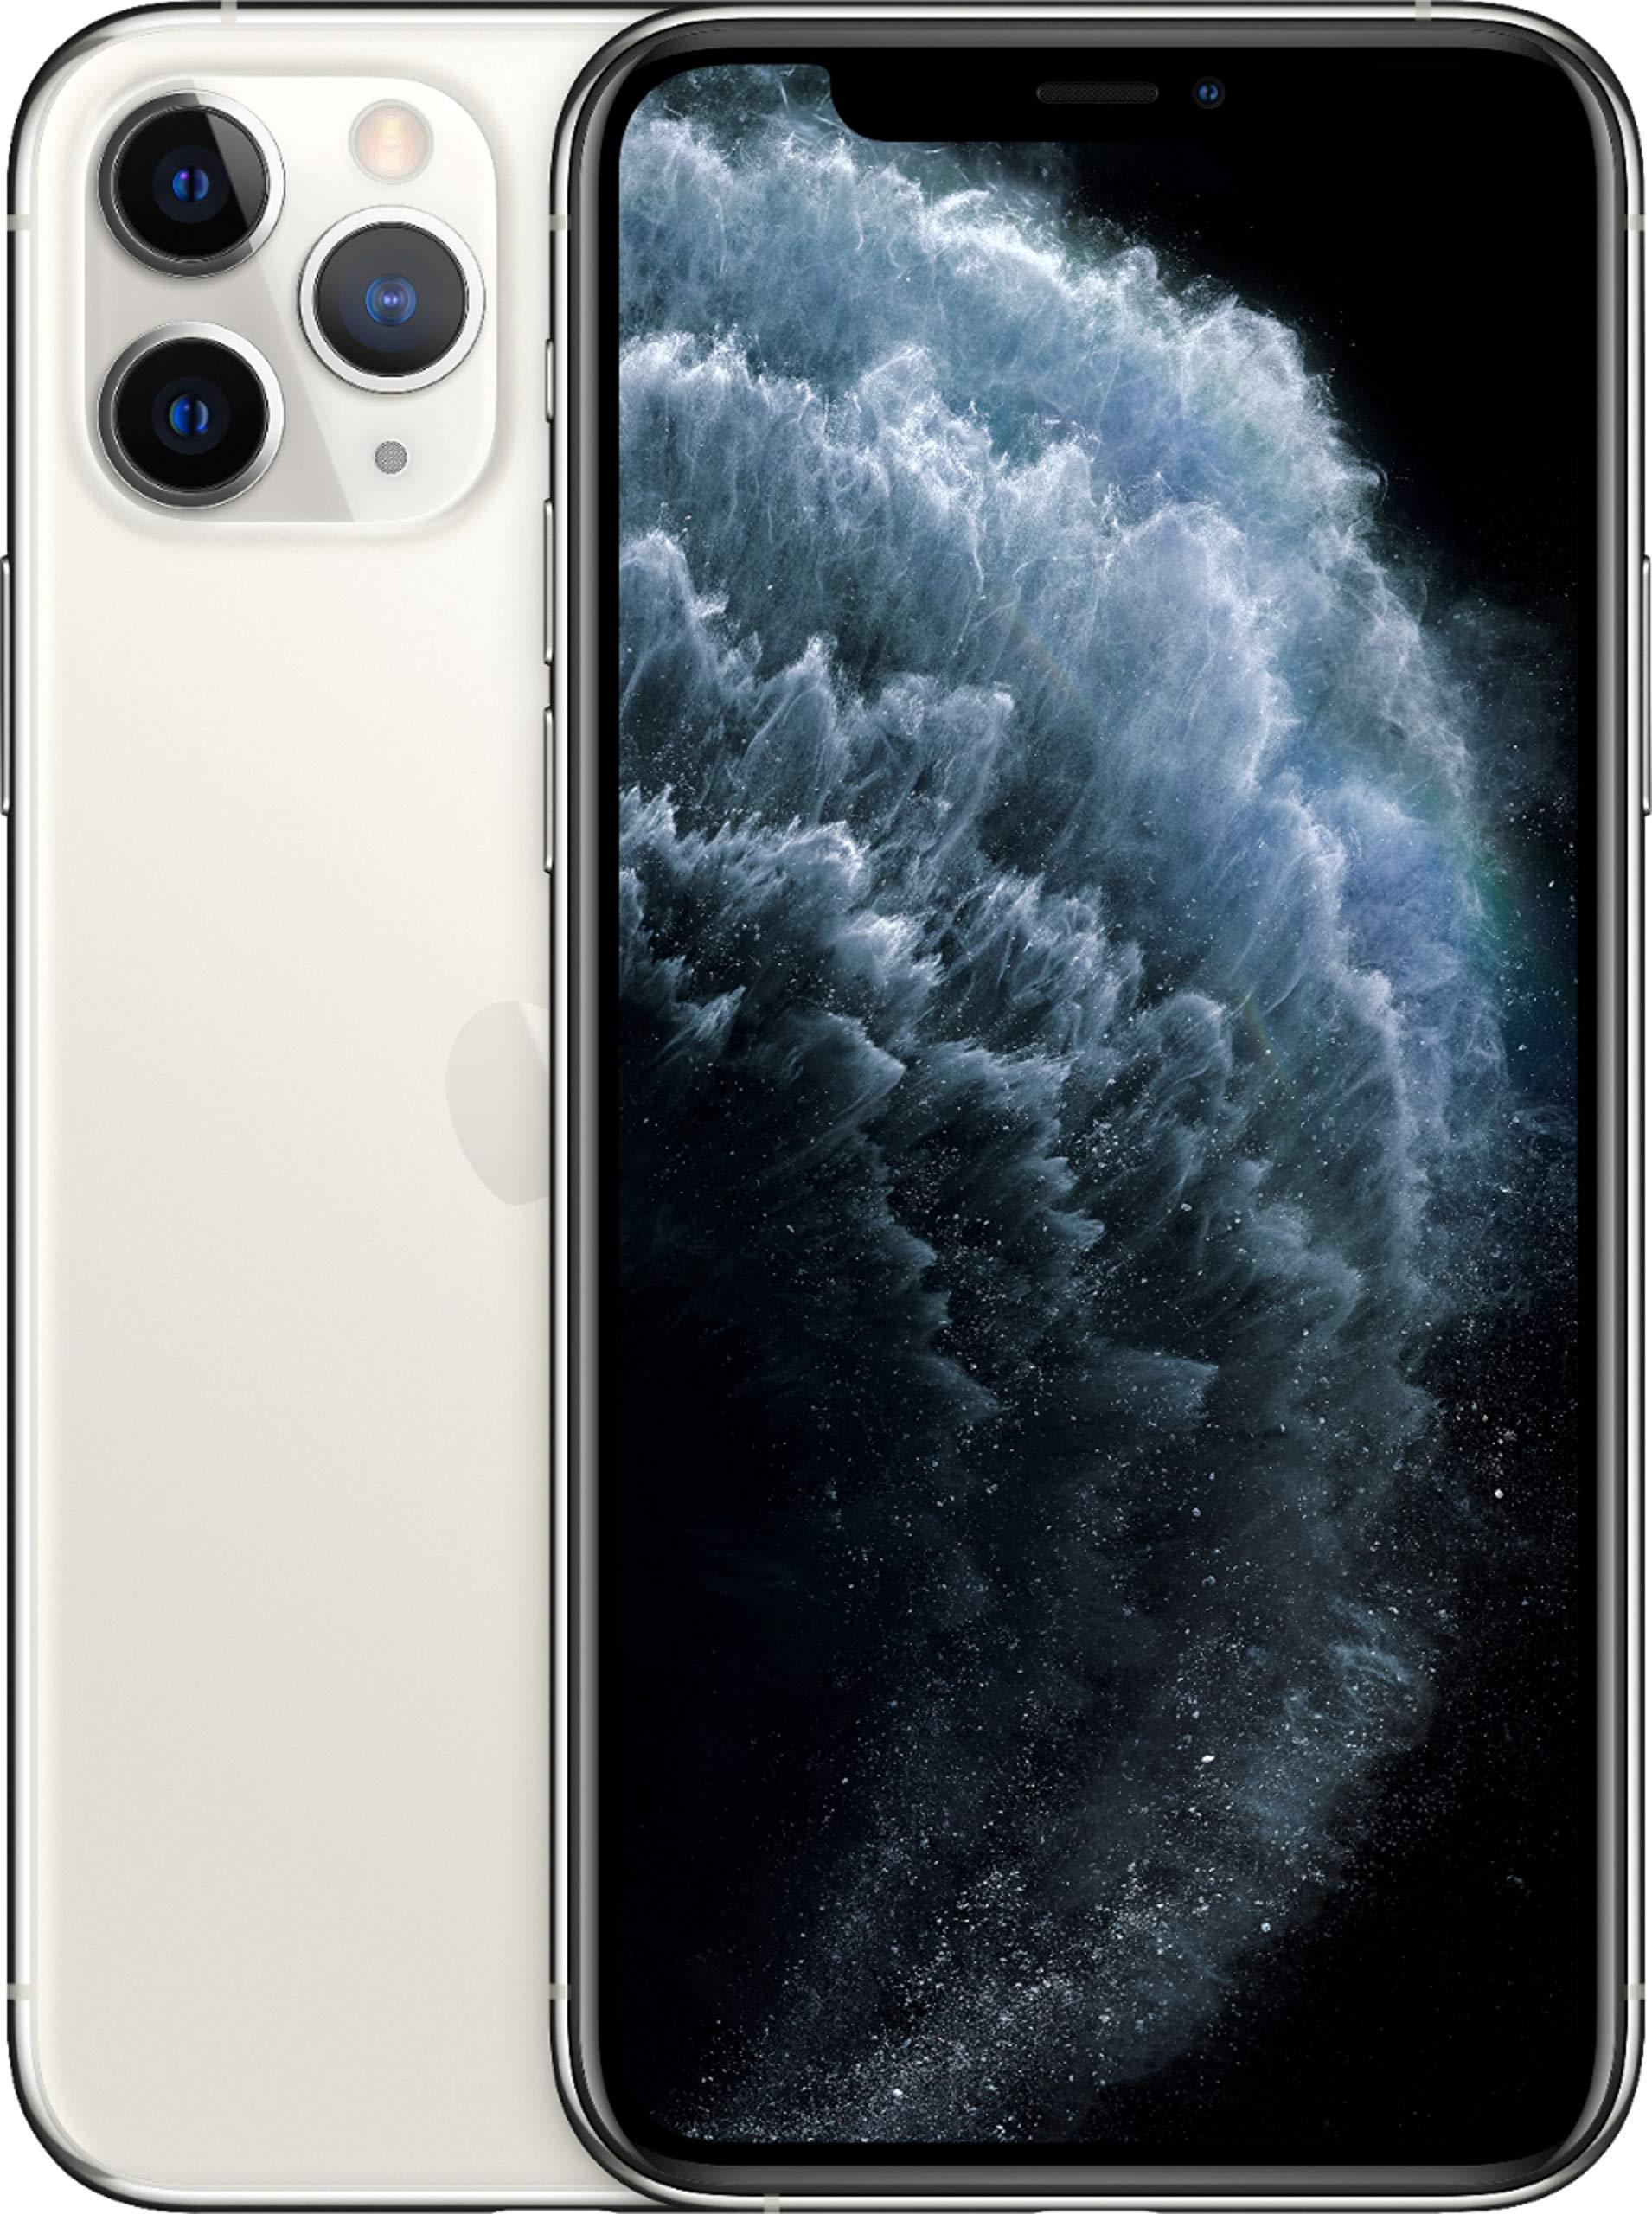 Apple iPhone 11 Pro Max, 64GB, Silver - Fully Unlocked (Renewed)